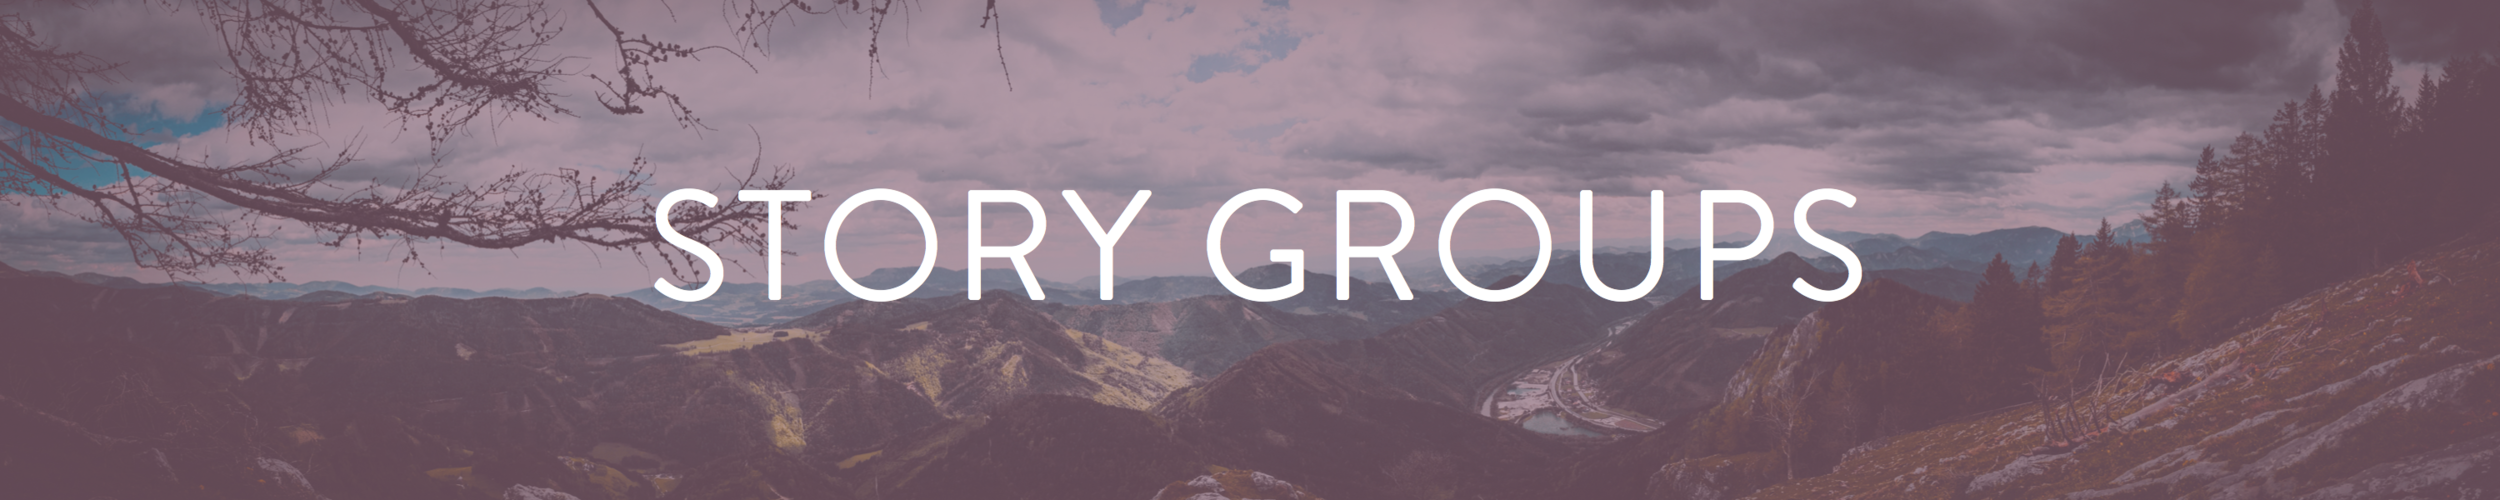 storygroups.png